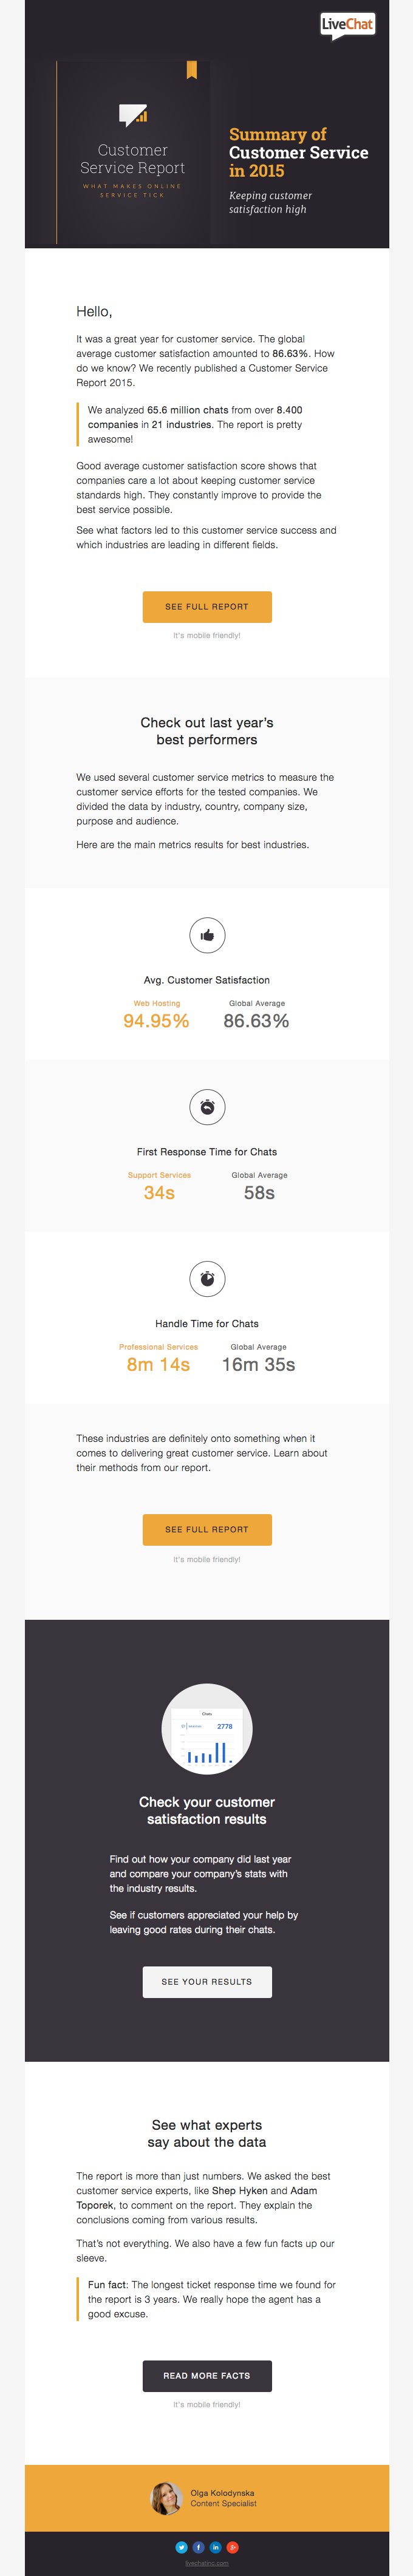 Customer Service Report 2015